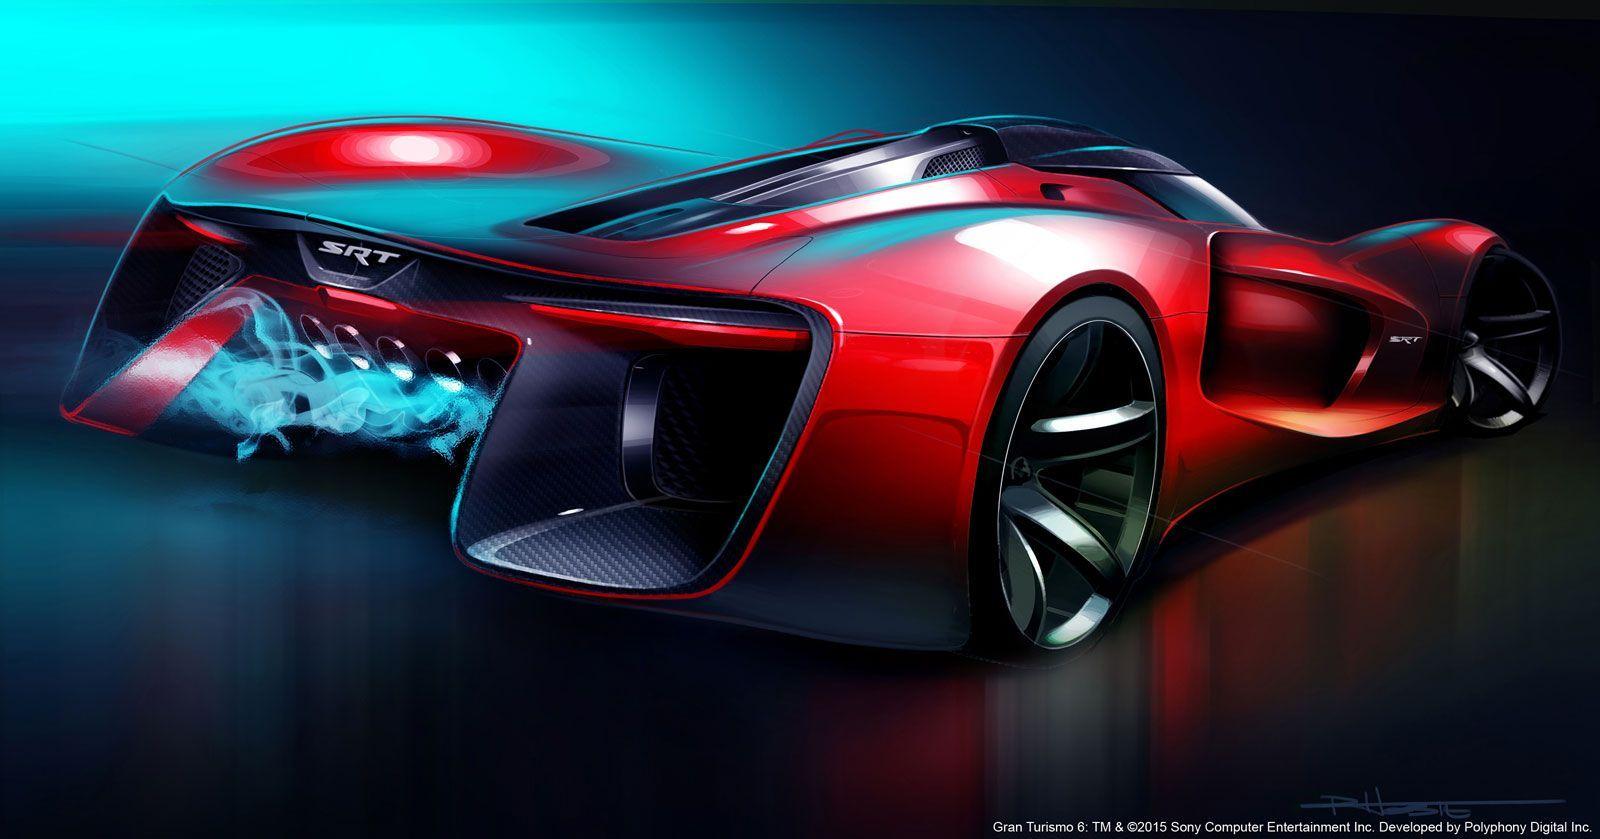 The Best Supercars Luxury Supercars Supercar Luxurycars Lamborghini Ferrari Cars Supercars Porsche Bmw Audi Supercar Srt Concept Cars Super Cars